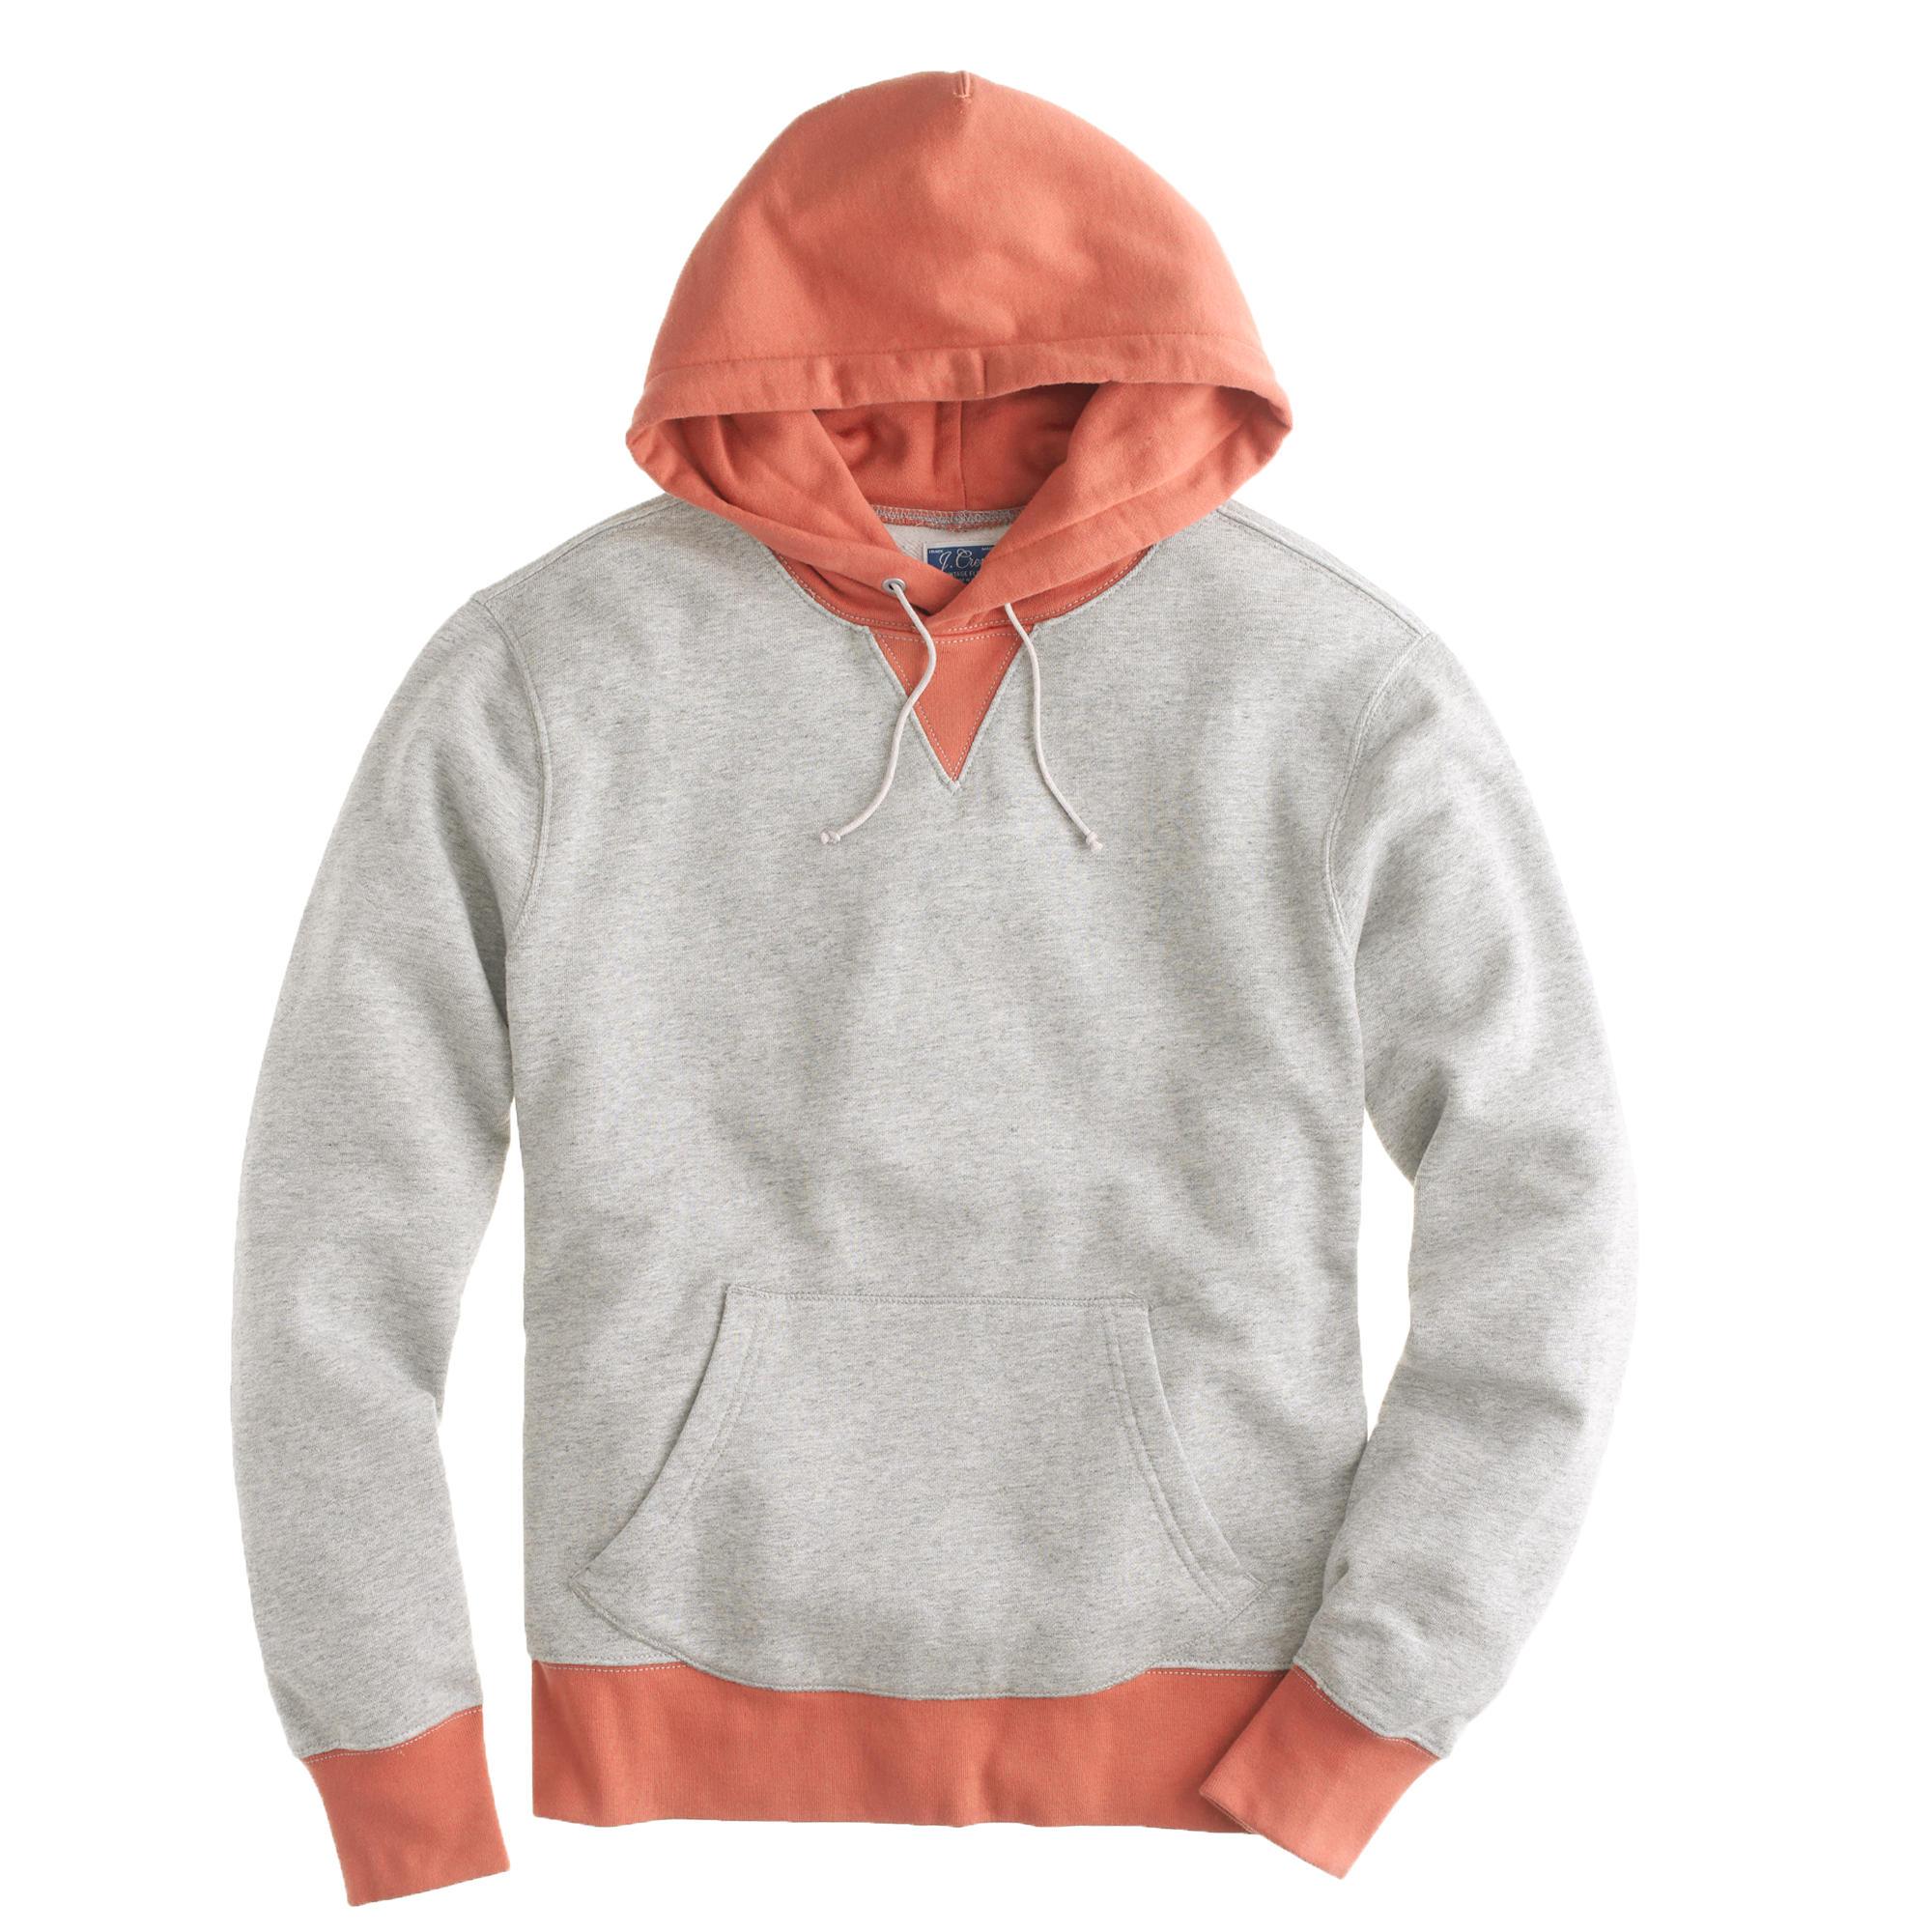 J crew hoodies